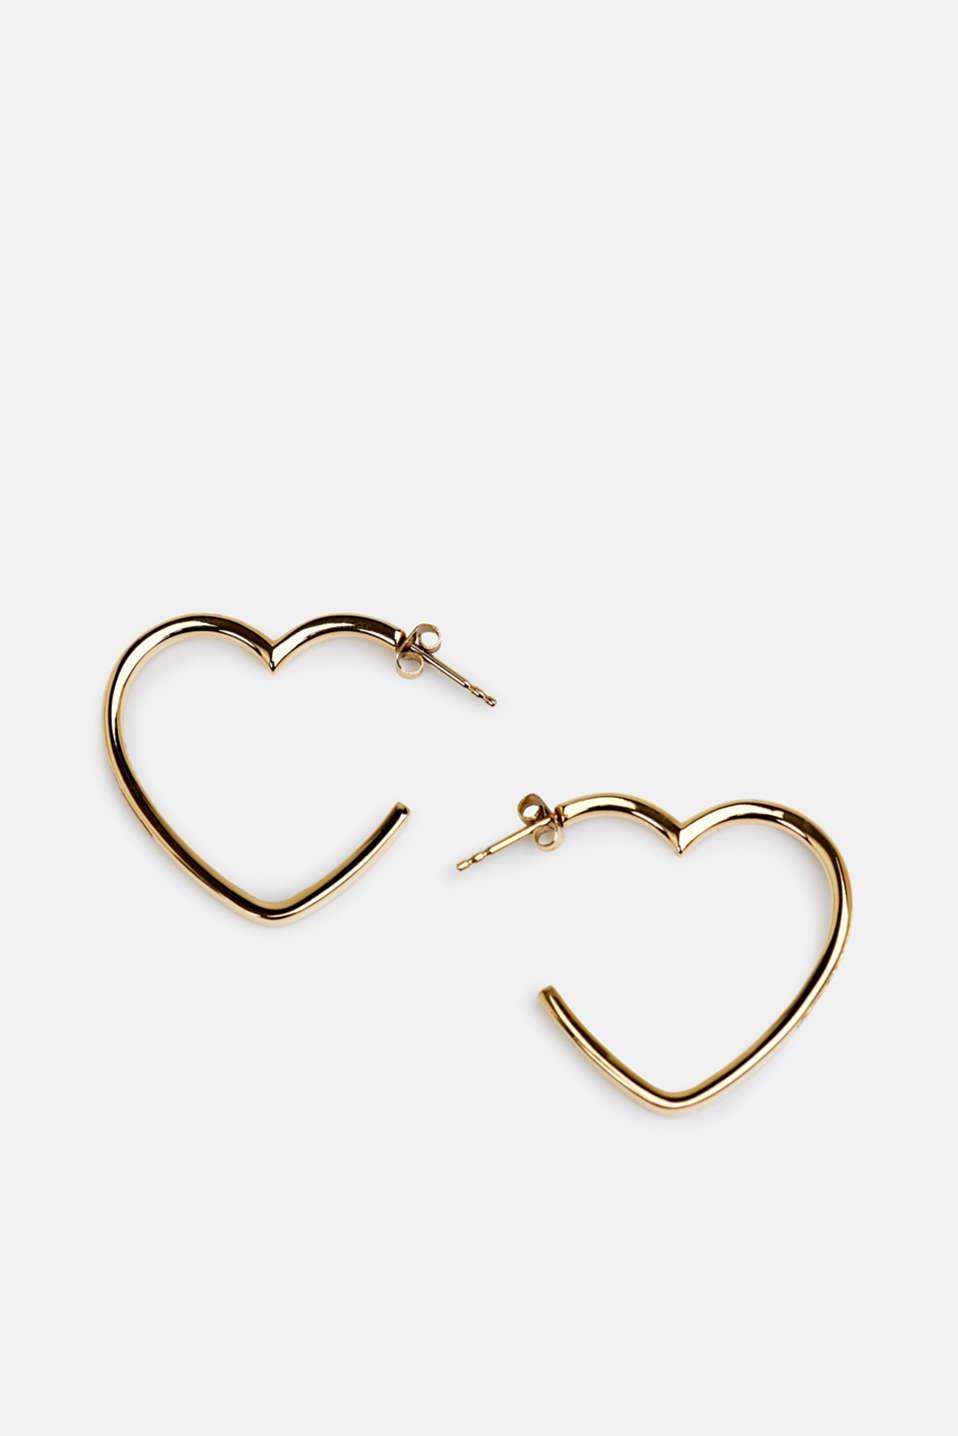 Stainless steel heart hoop earrings, LCGOLD, detail image number 0